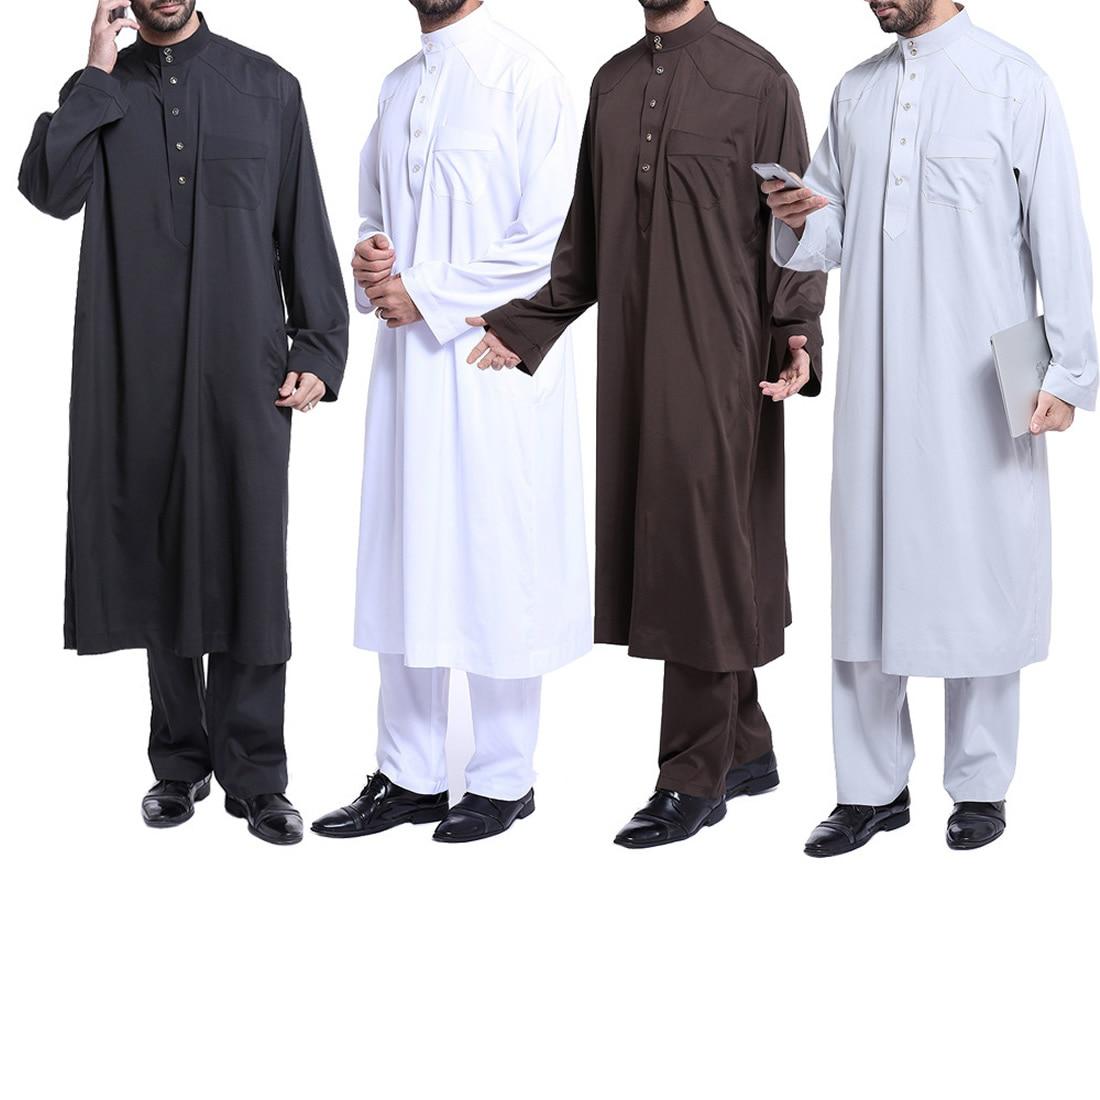 Plus Size Homens Vestido Dos Muçulmanos Vestuário Islâmico 2 Peças Conjunto Formal Vestido Paquistão Musulman Homme Jubah Abaya Caftan Islam Roupas